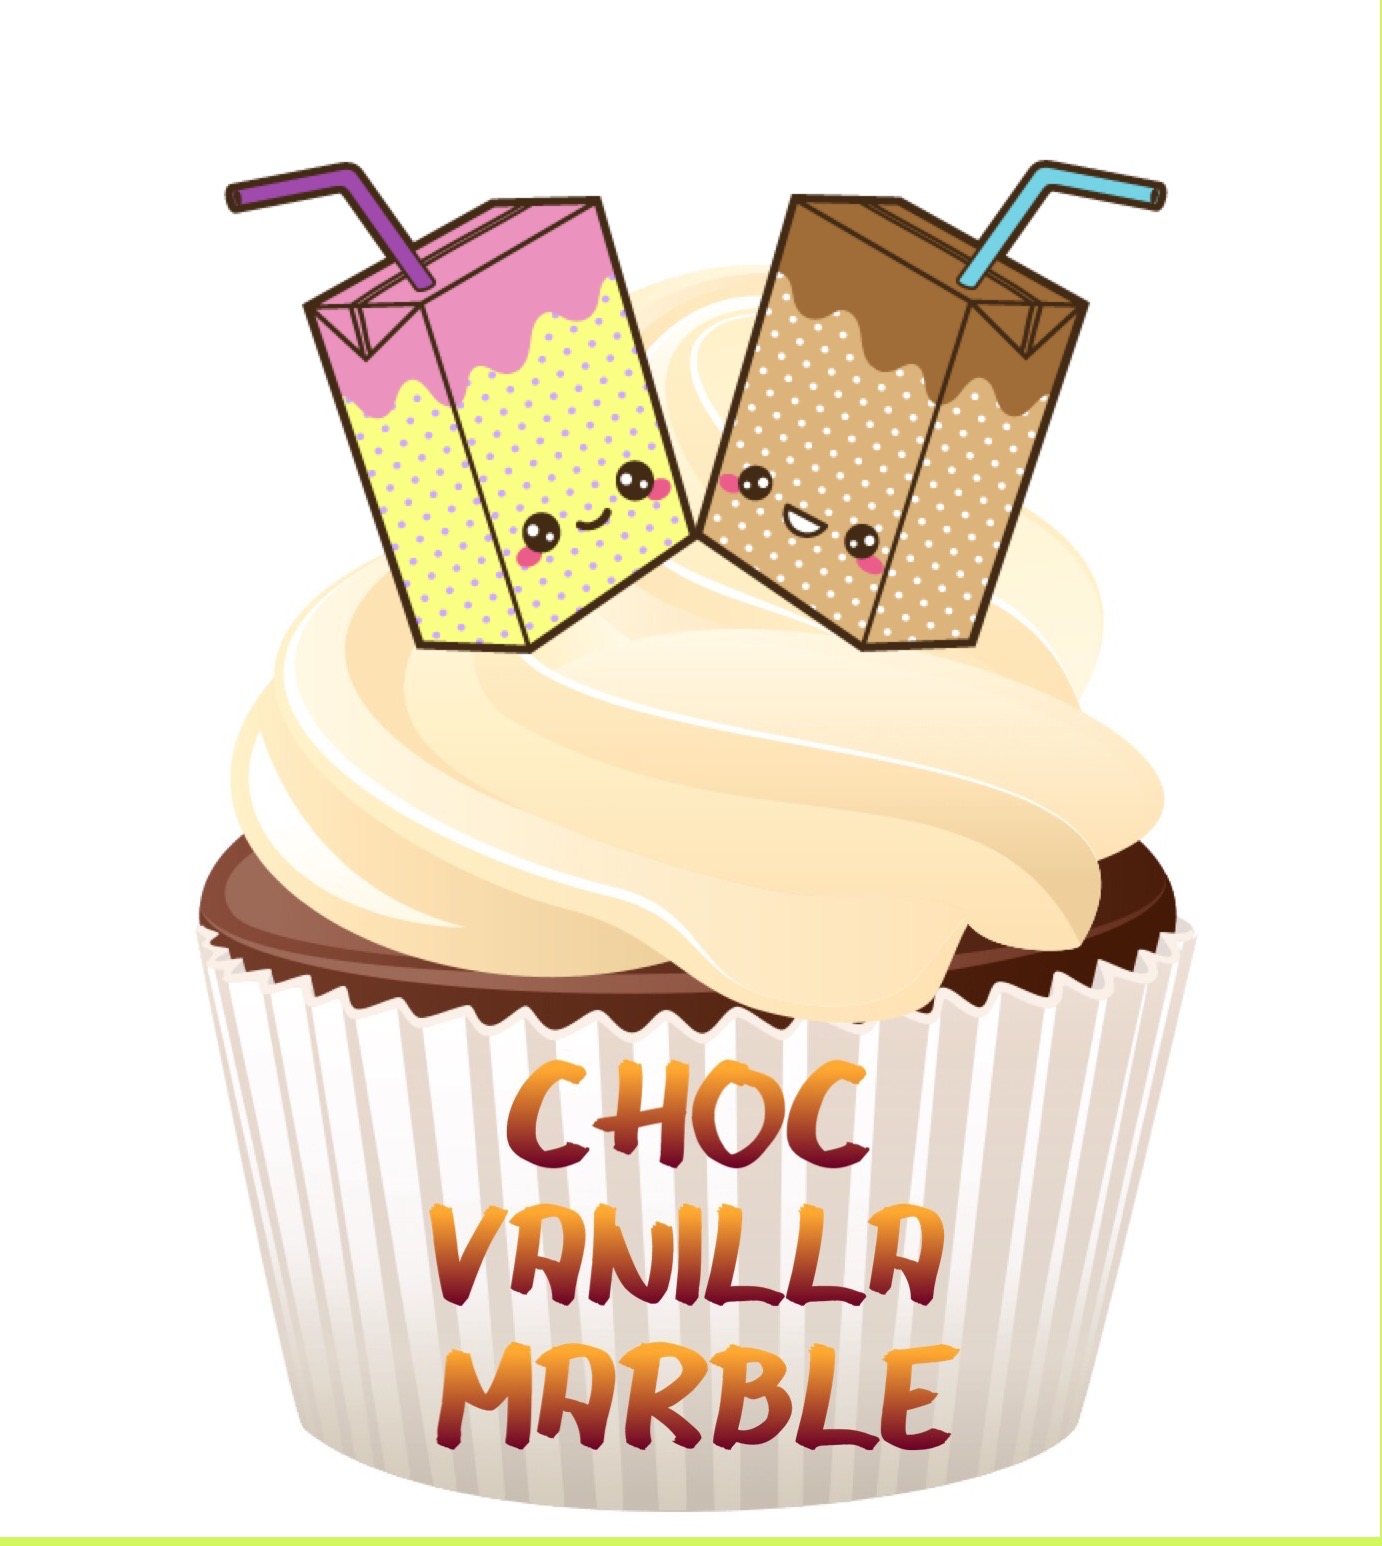 Choc Vanilla Marble